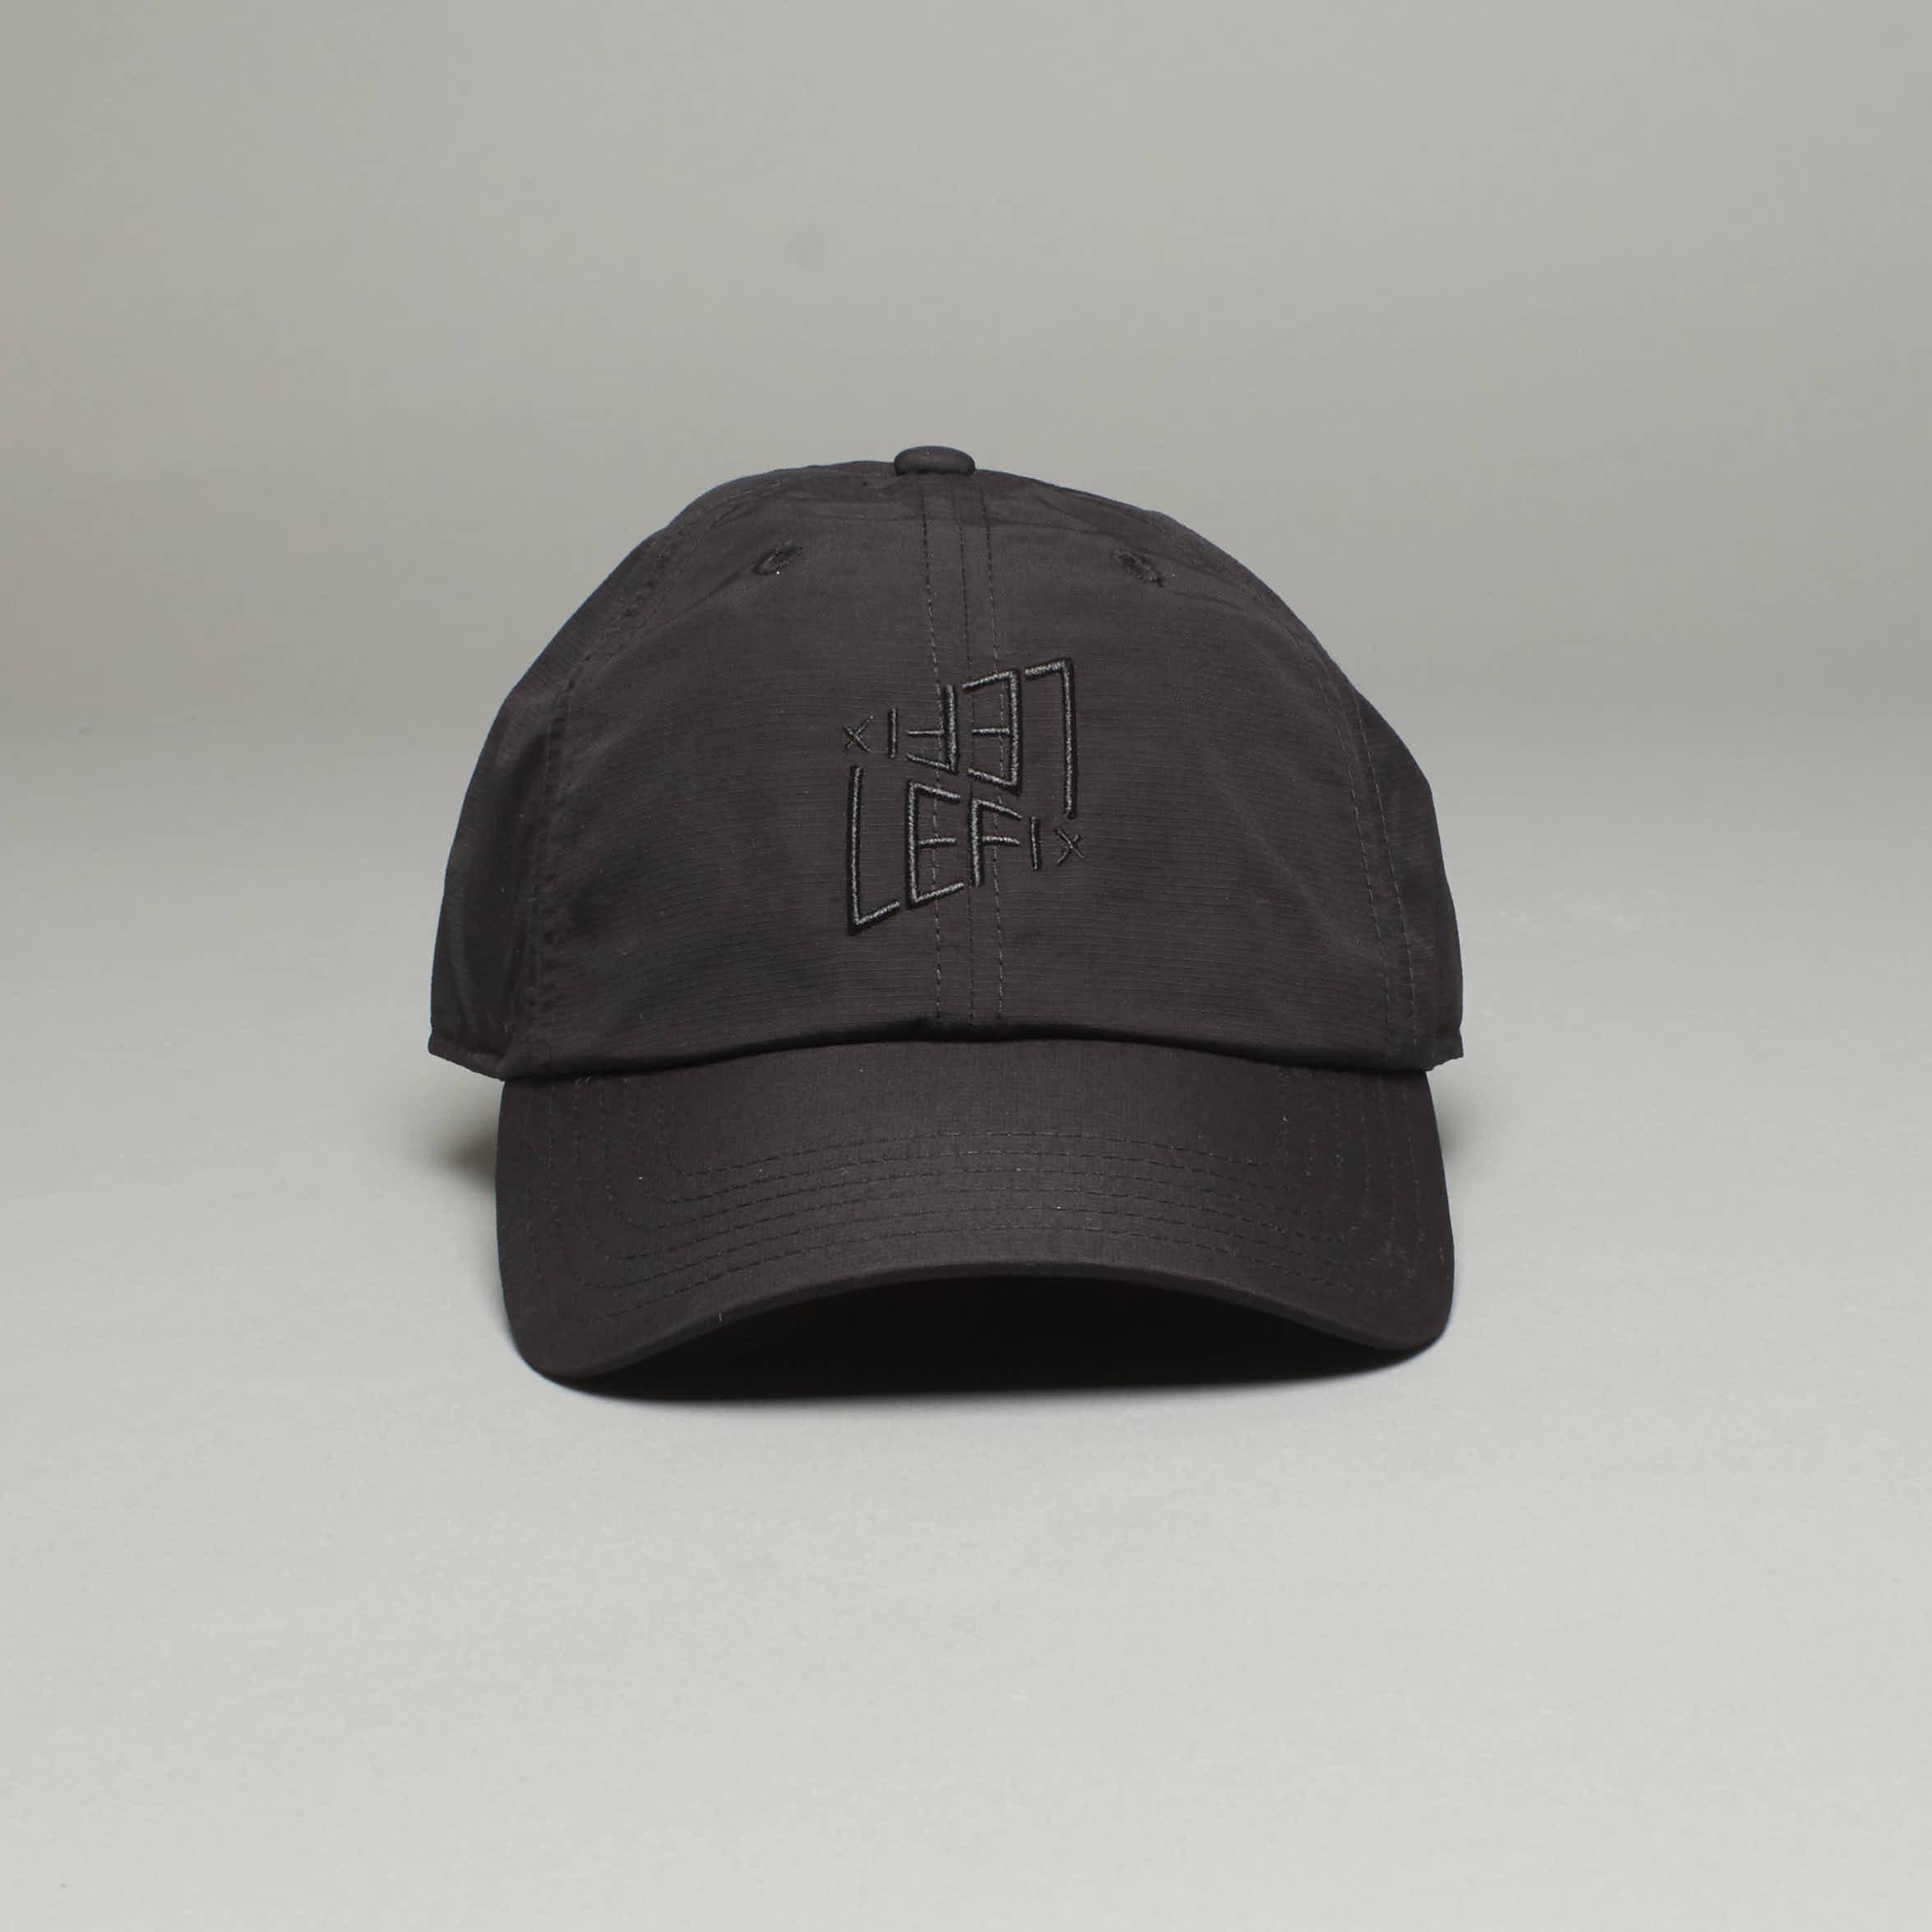 LE FIX CAP TECH BLACK  300 DK